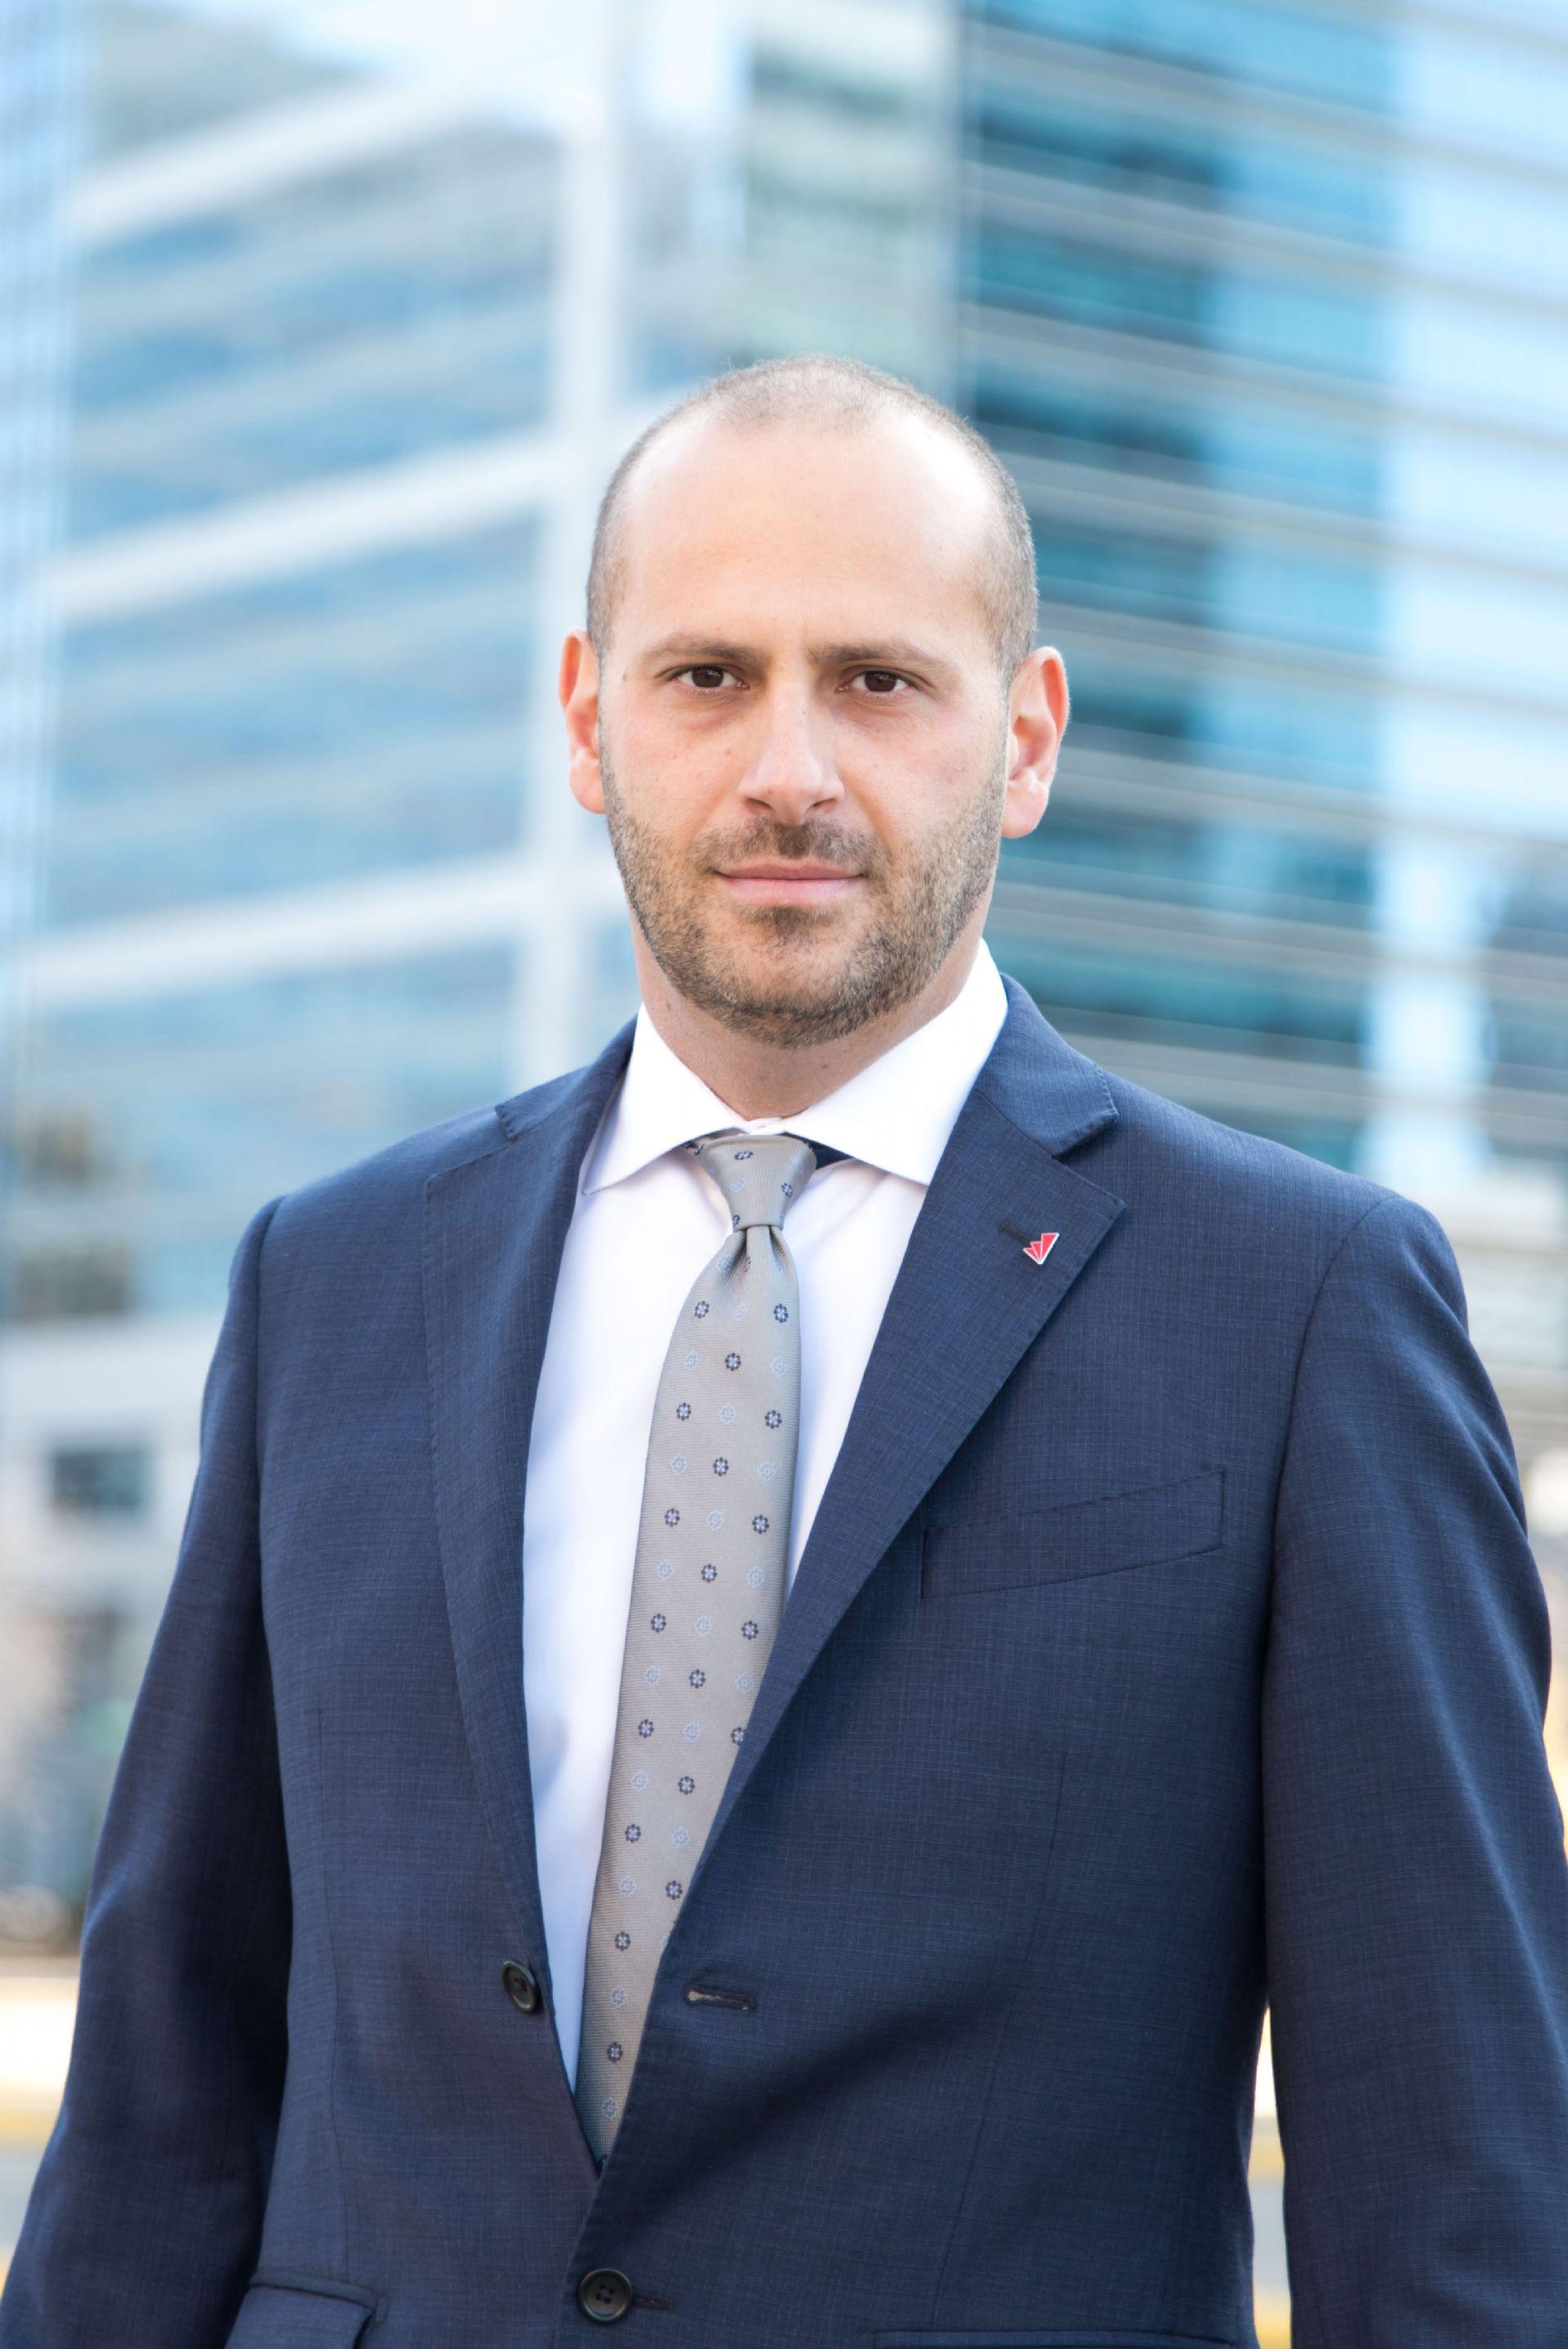 Giulio Galleri, Canada Country Manager at Bonatti